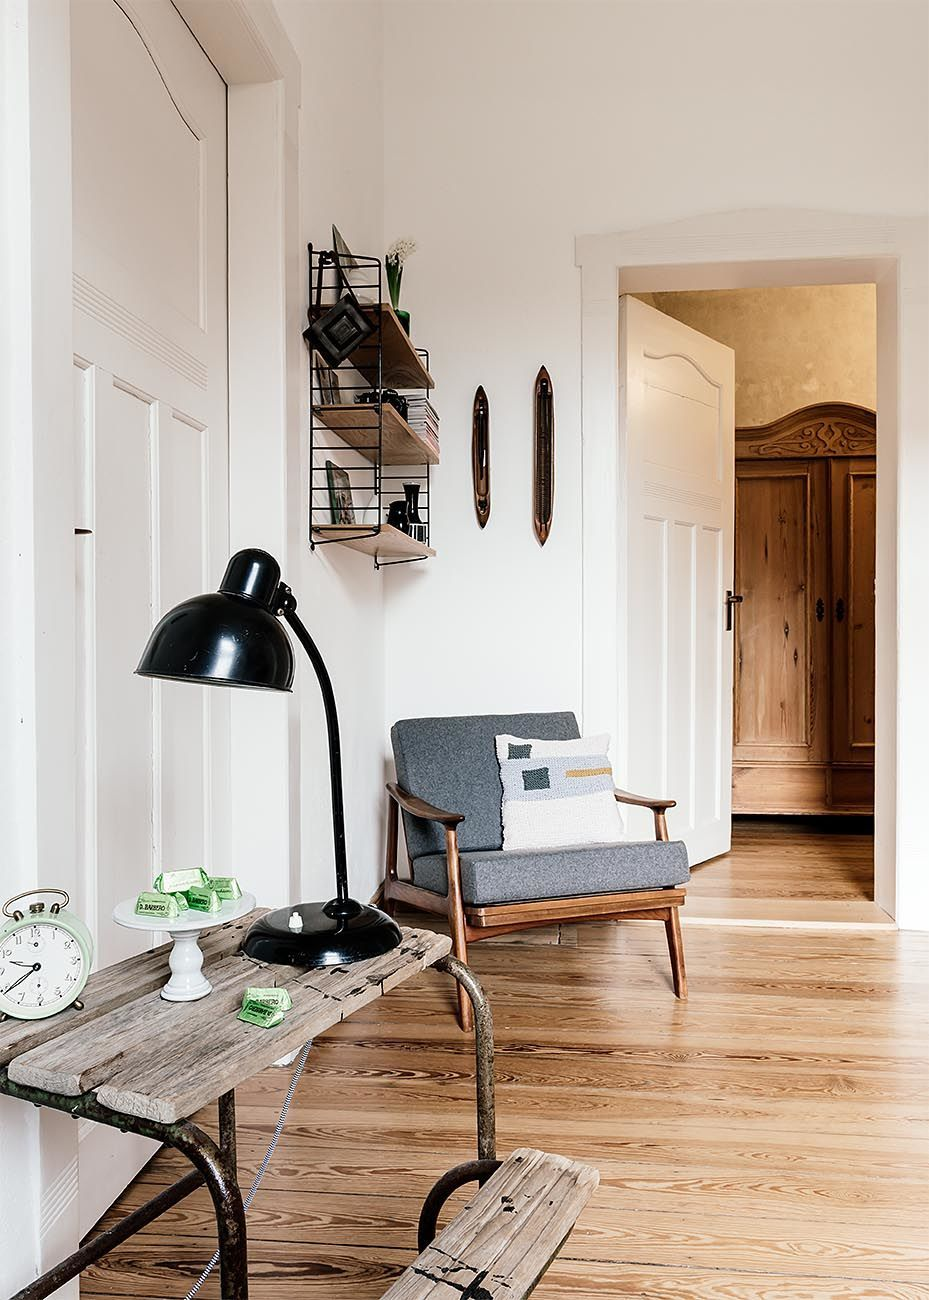 beautiful ideen zur inneneinrichtung farben bilder contemporary house design ideas. Black Bedroom Furniture Sets. Home Design Ideas